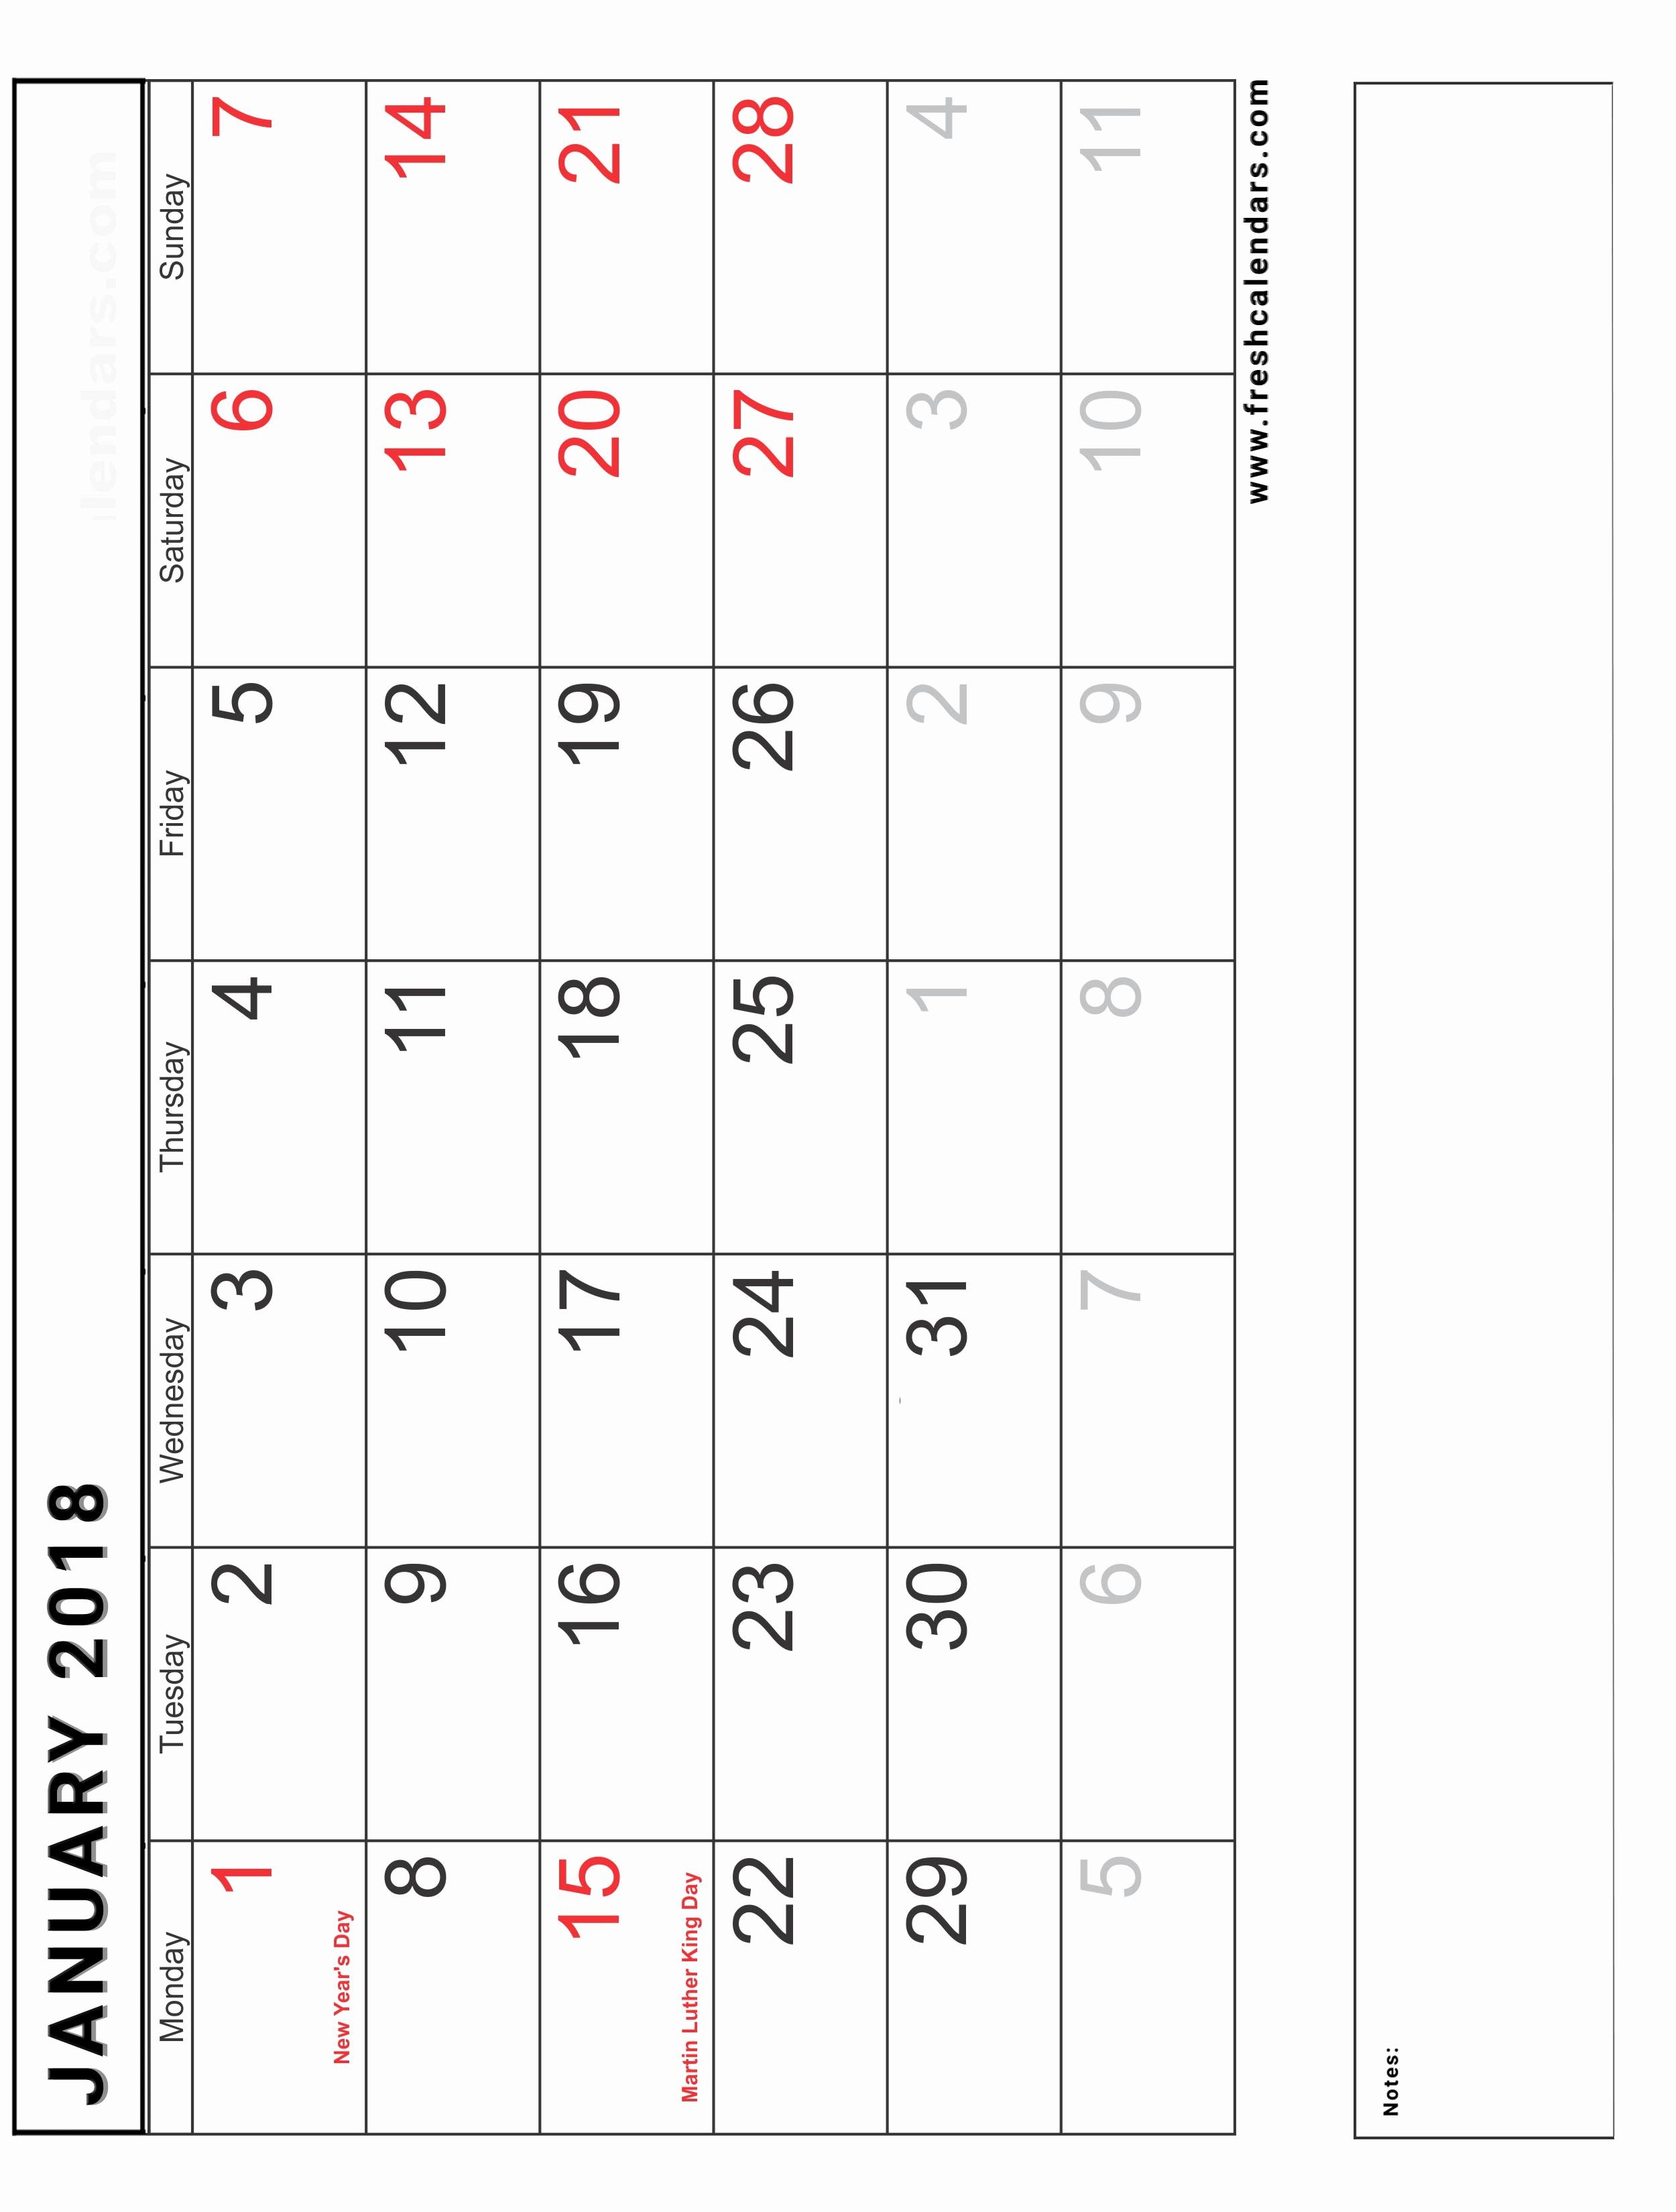 Calendar 2018 Printable with Holidays Luxury Blank January 2018 Calendar Printable Templates